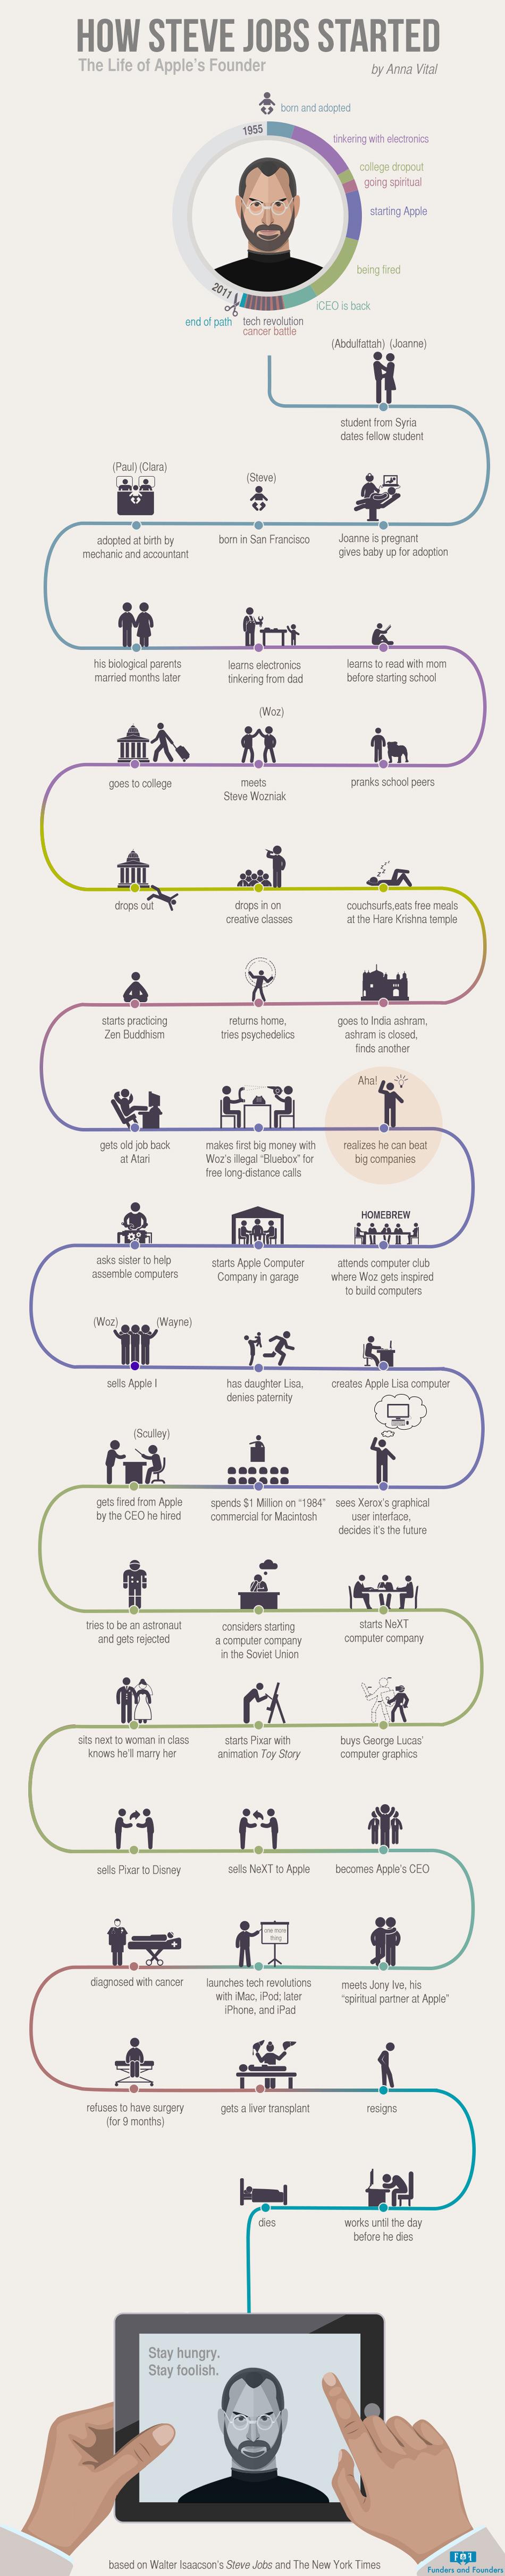 infografico-a-vida-de-steve-jobs